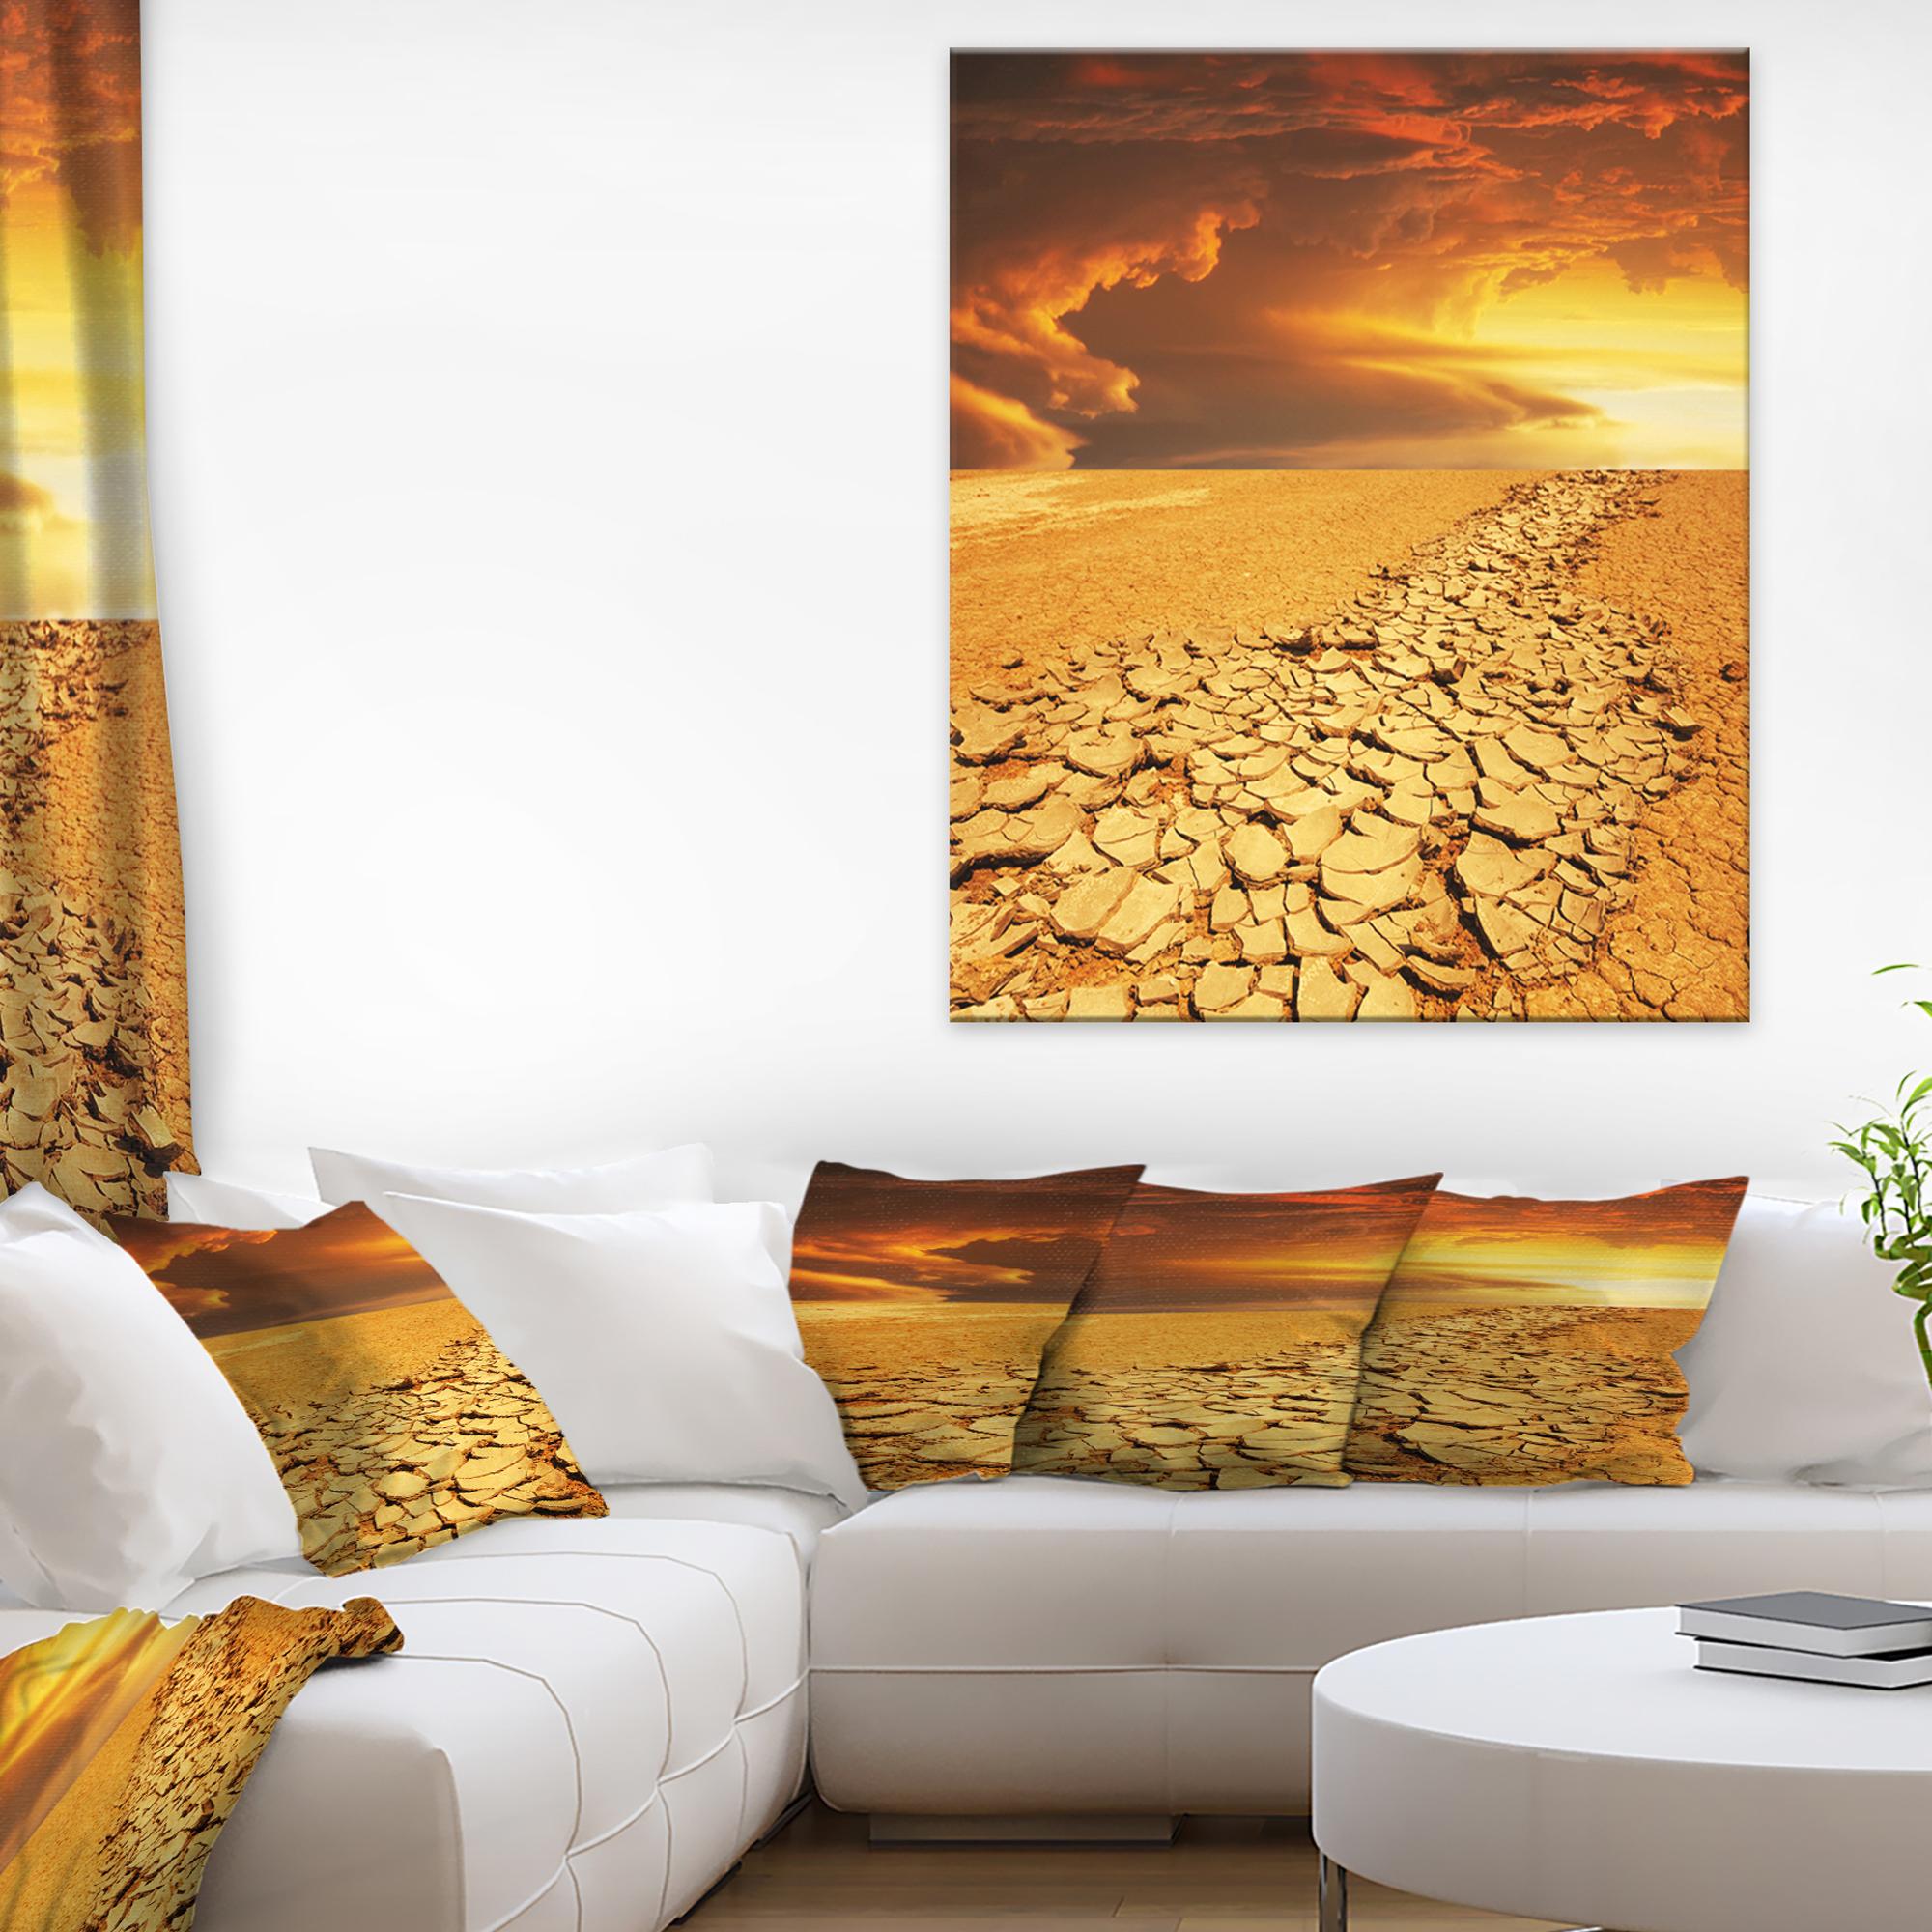 Drought Land under Dramatic Sky - image 1 de 1